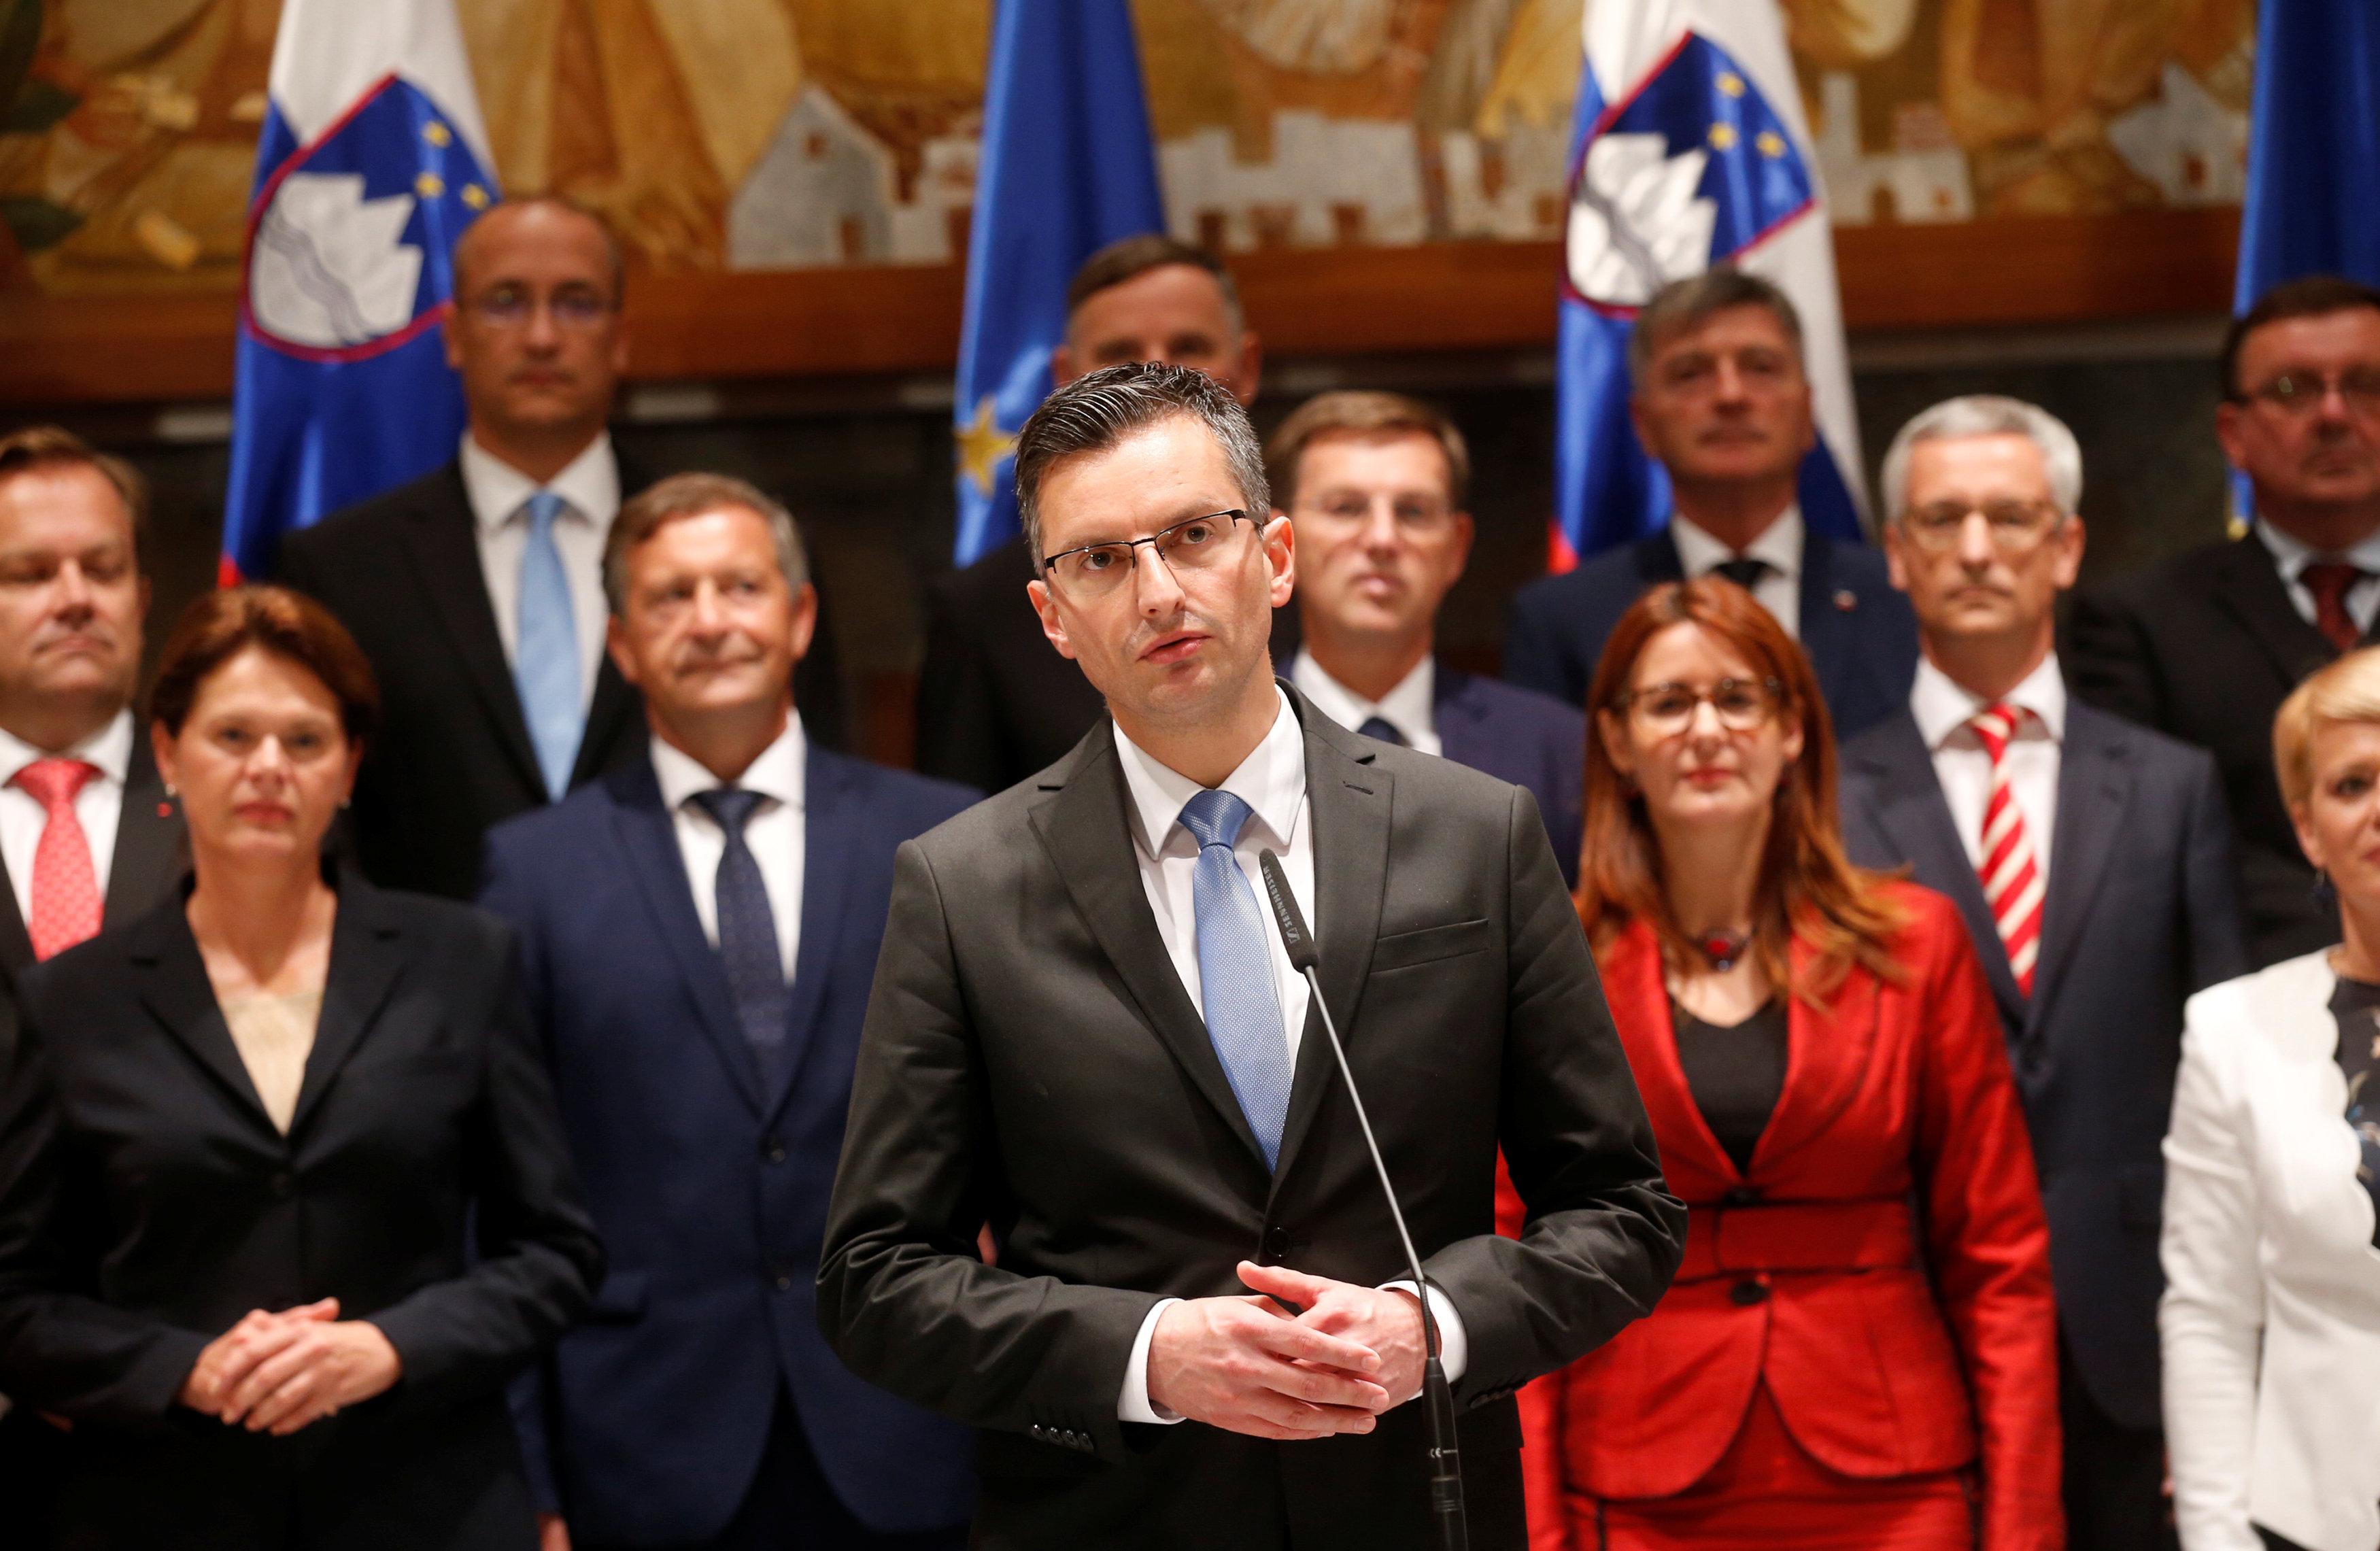 Na zapadu zasad ništa novo – nova slovenska vlada na čelu s Marjanom Šarcem /  REUTERS